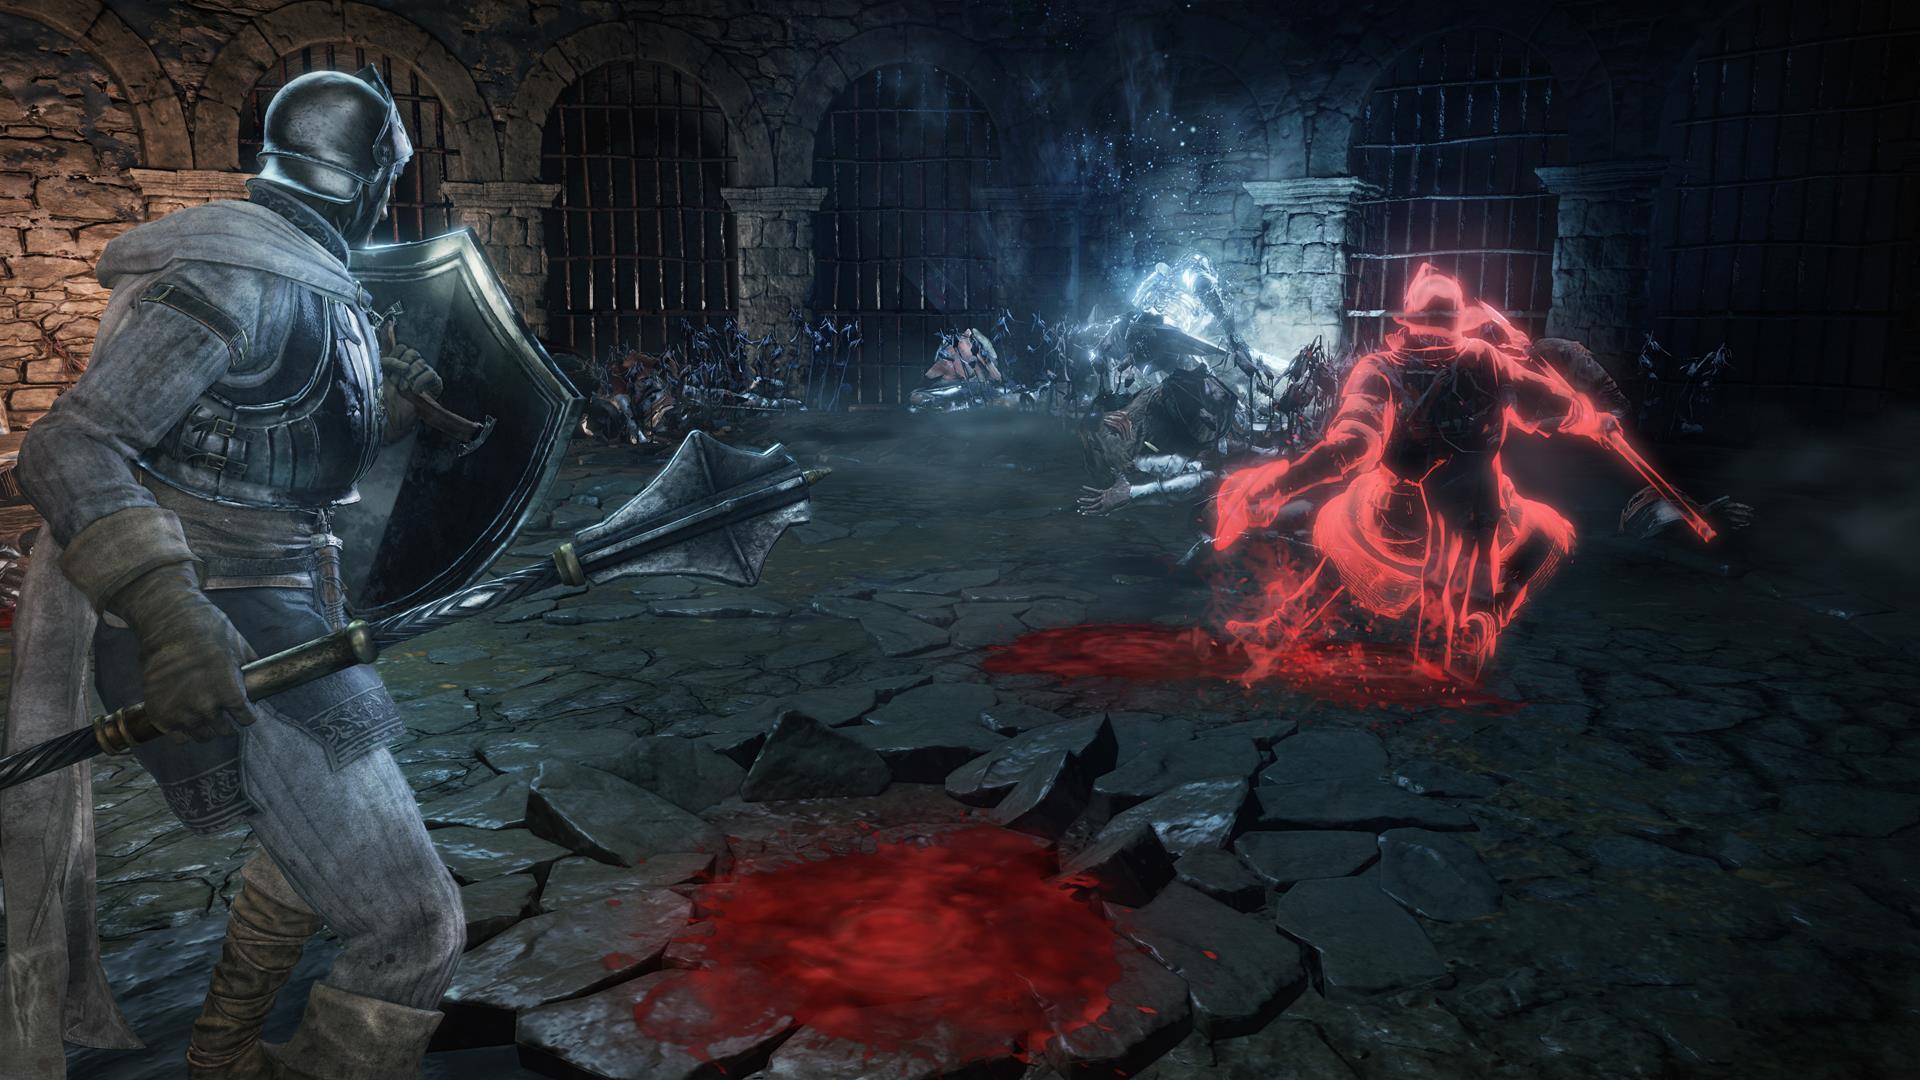 New Dark Souls 3 screens show co-op, spells, miracles, invasions